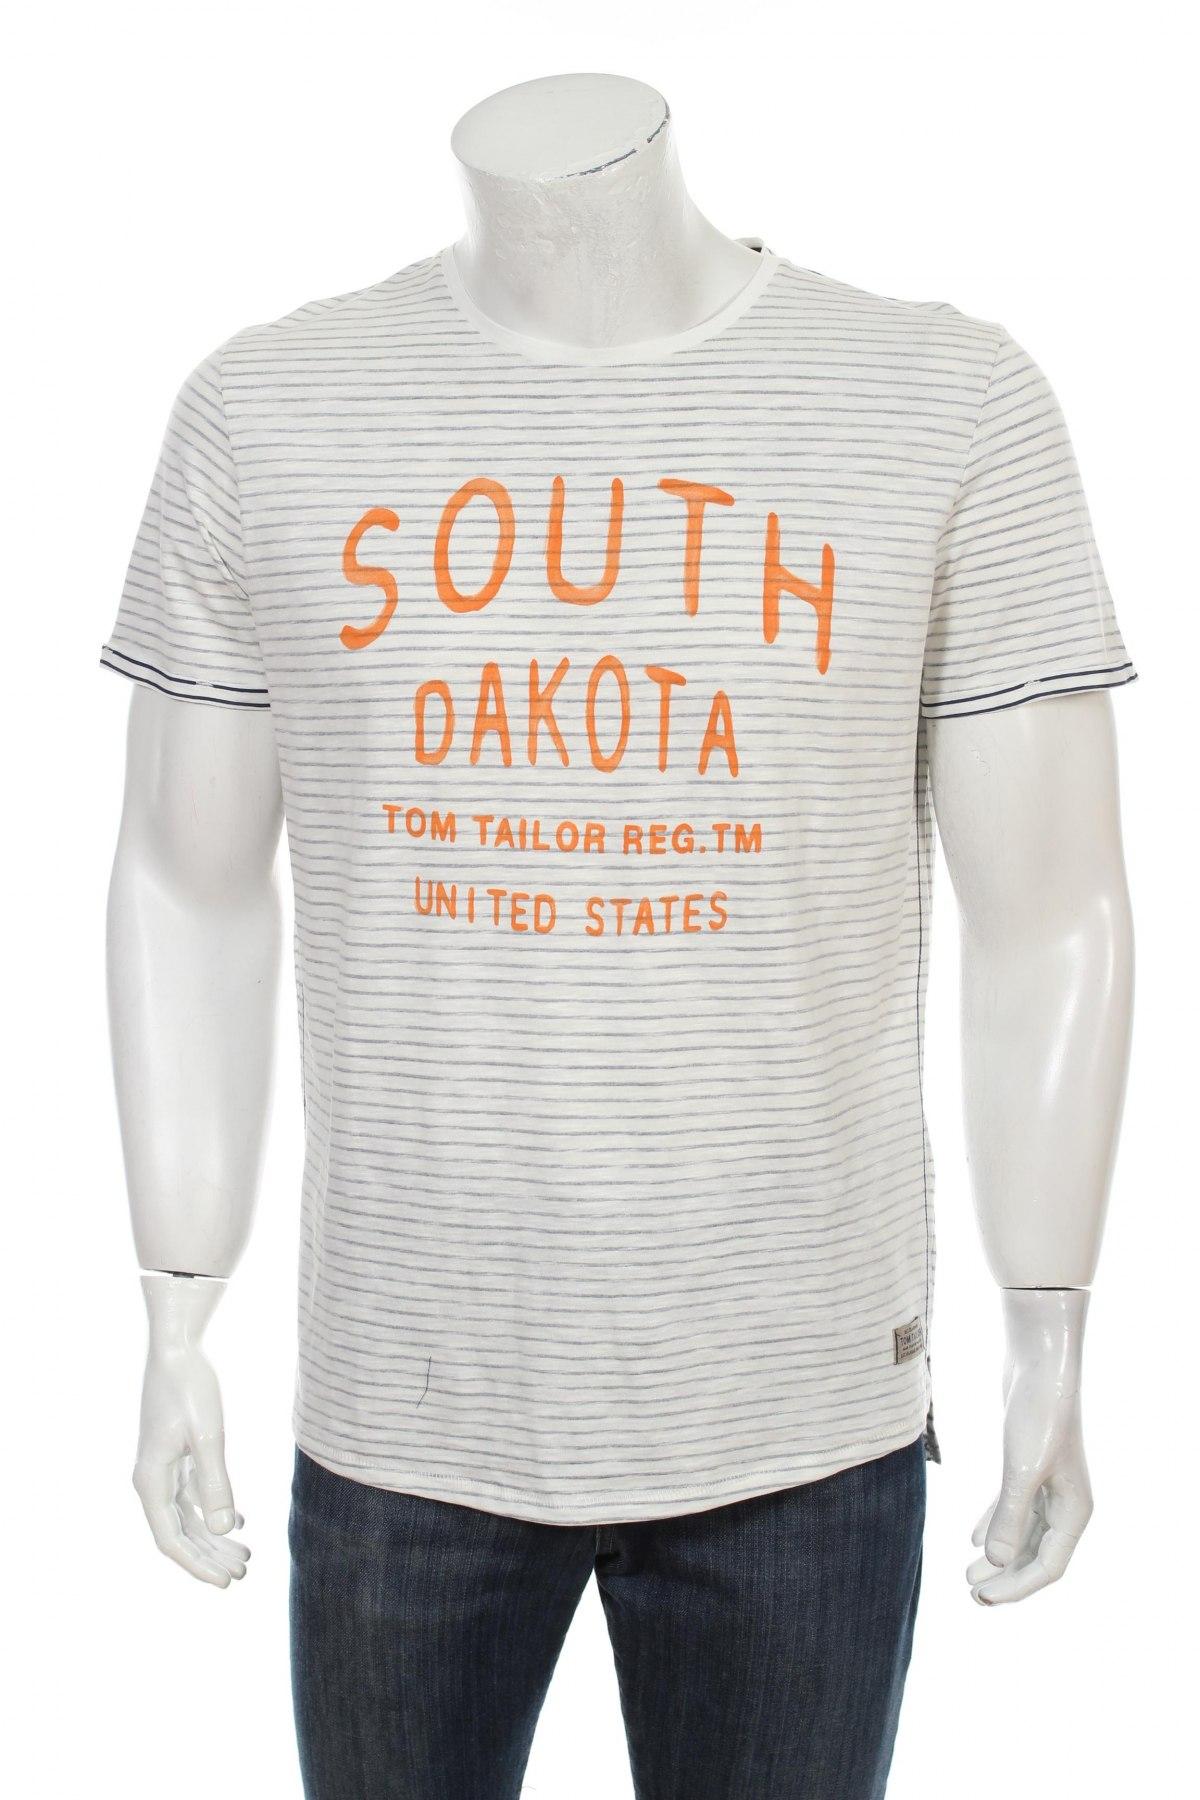 later fashion factory price Herren T-Shirt Tom Tailor